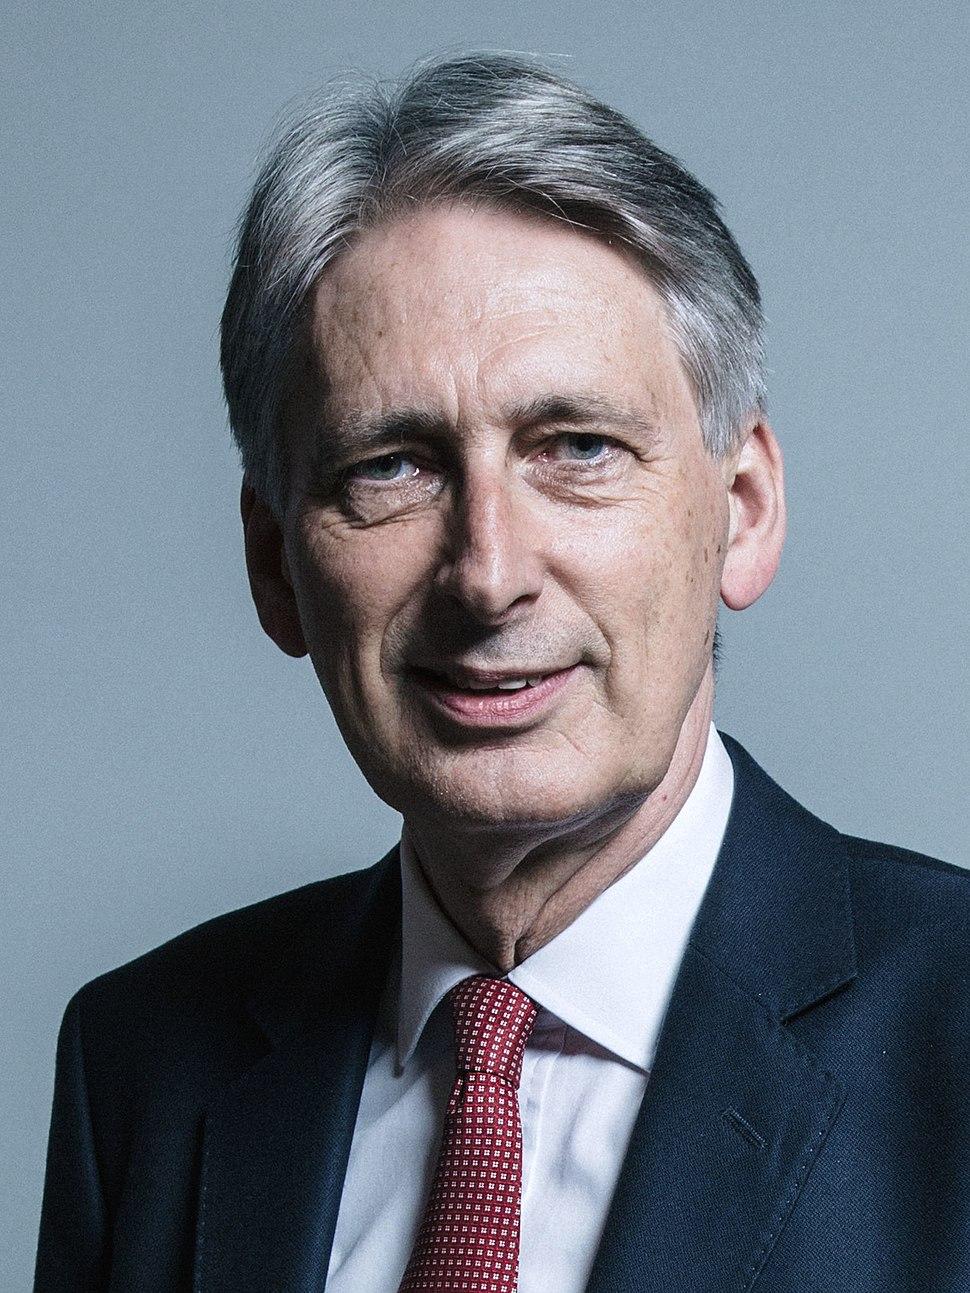 Official portrait of Mr Philip Hammond crop 2